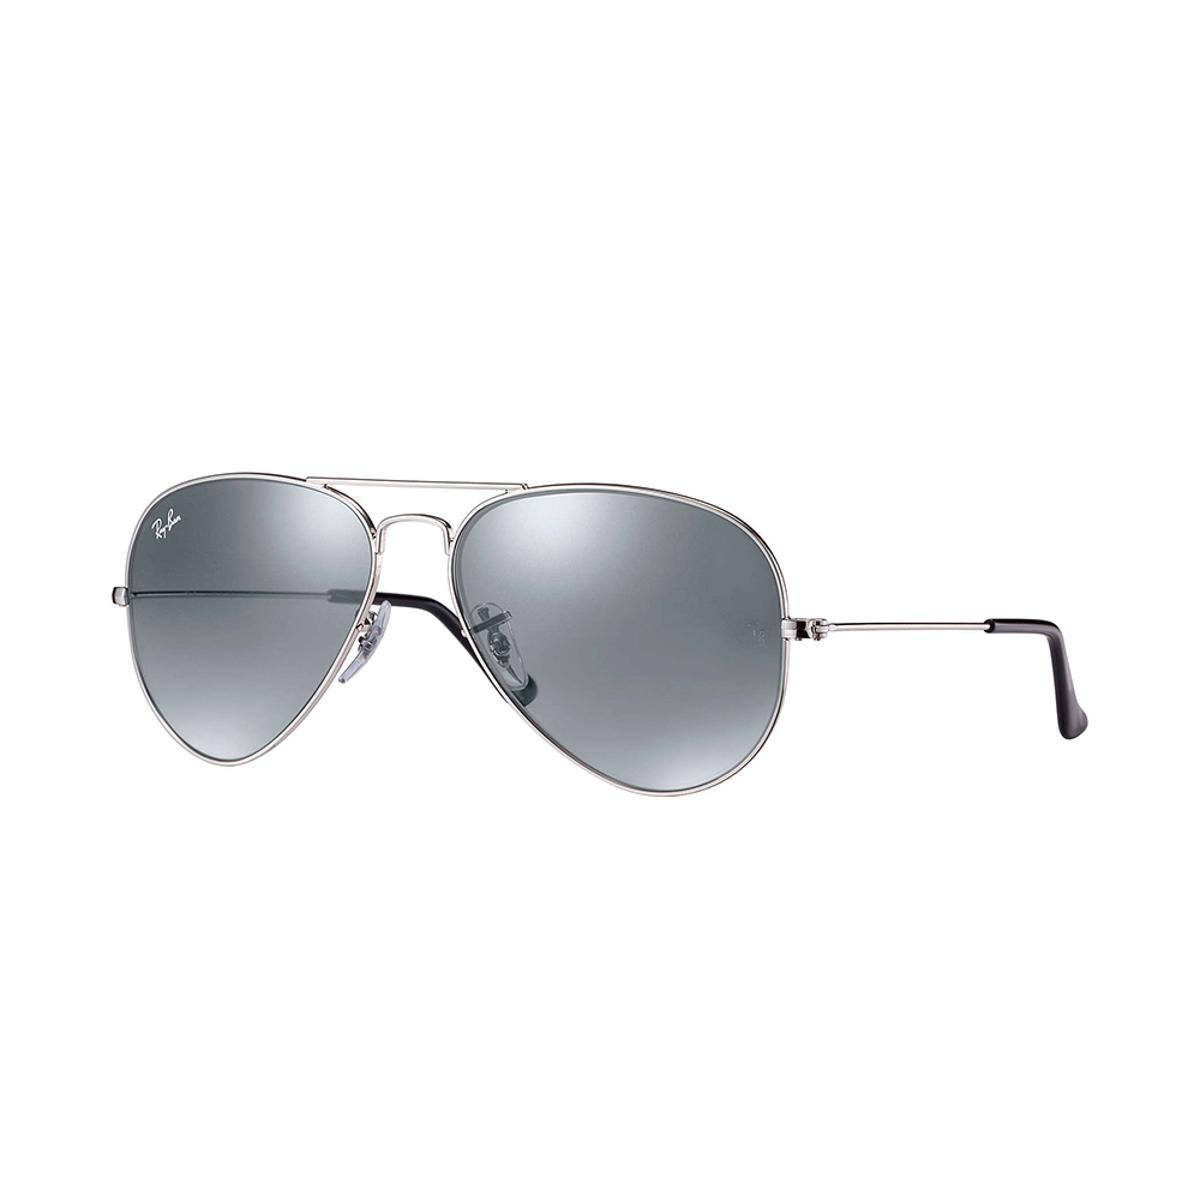 Óculos de Sol Ray-Ban Aviator Large Metal - Prata - Compre Agora ... 29609b81ae